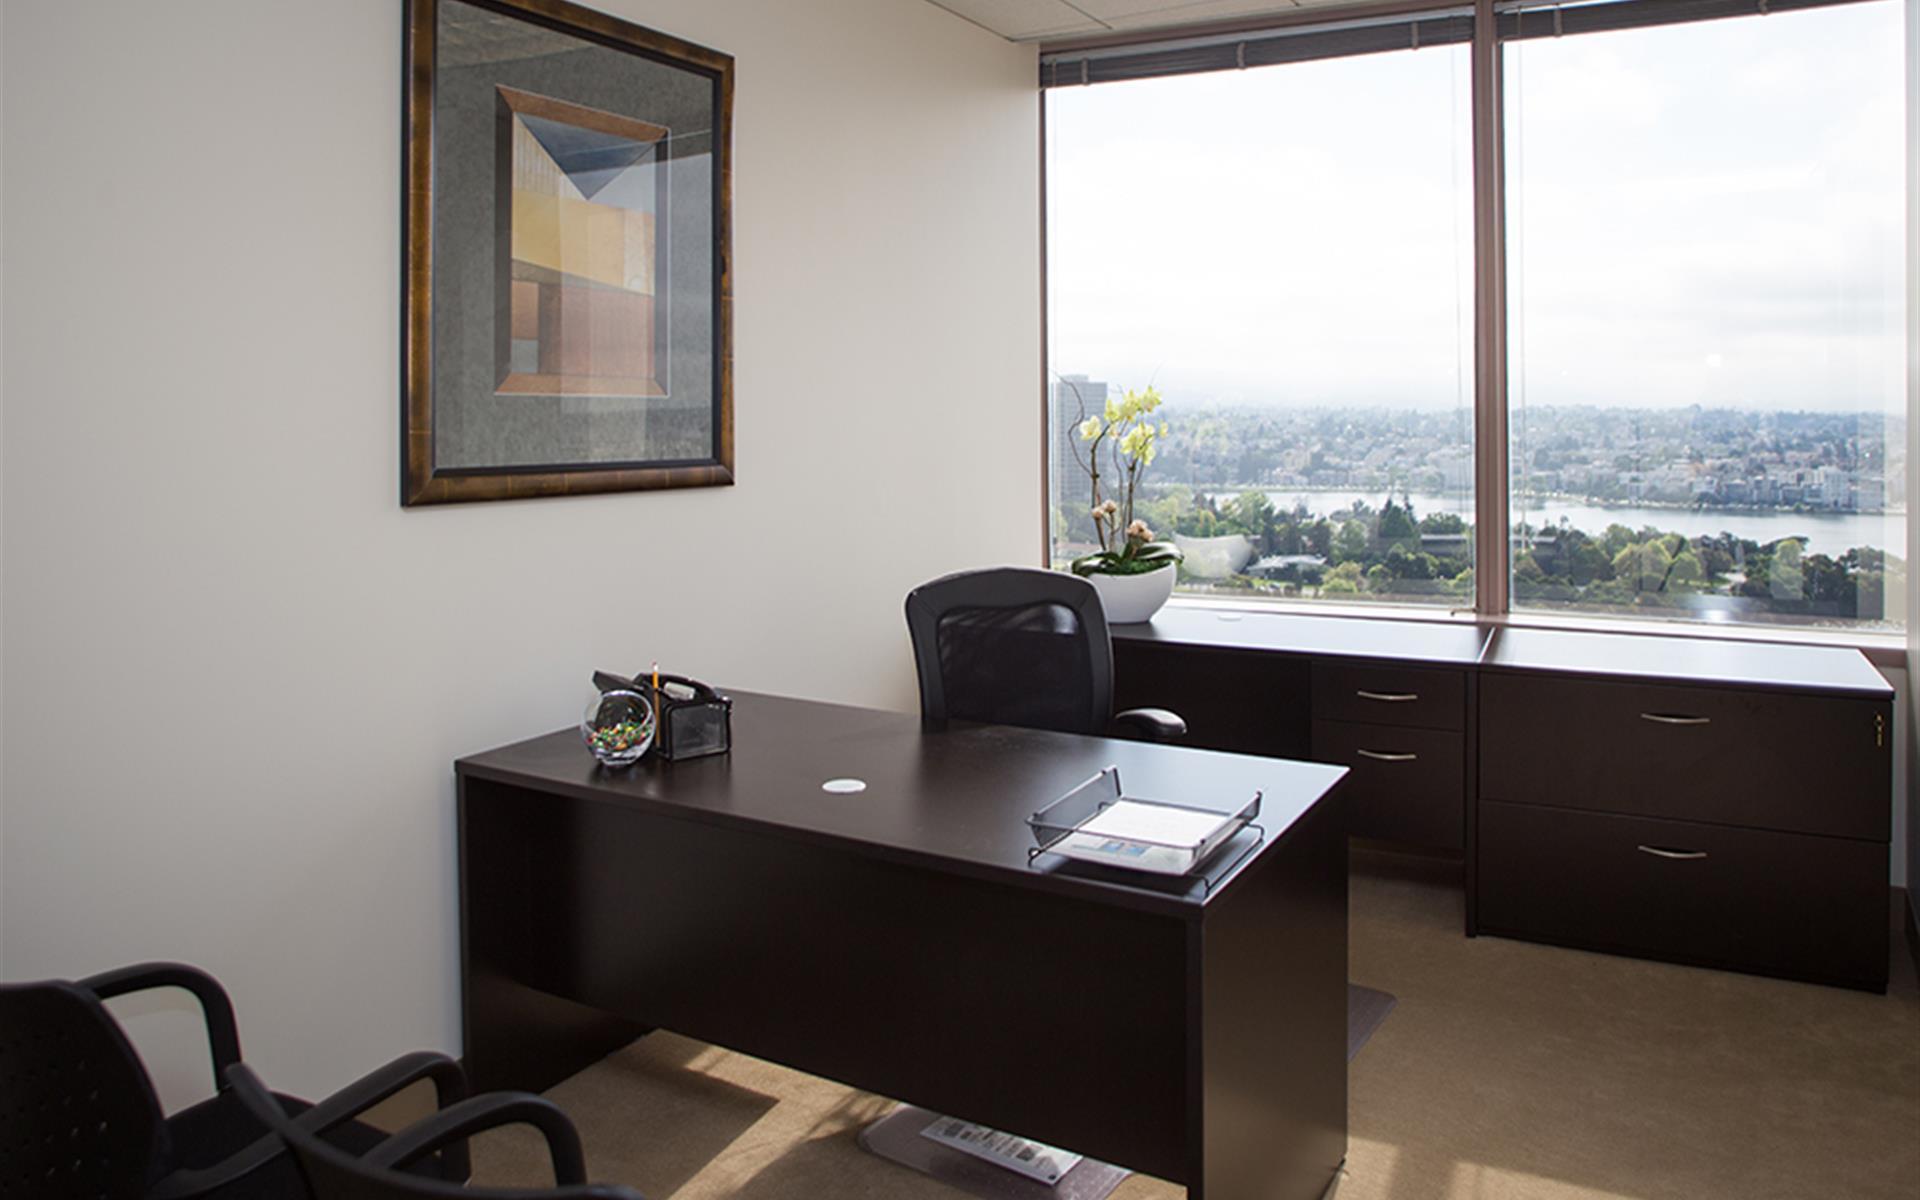 (OAK) Lake Merritt Plaza - Exterior Office